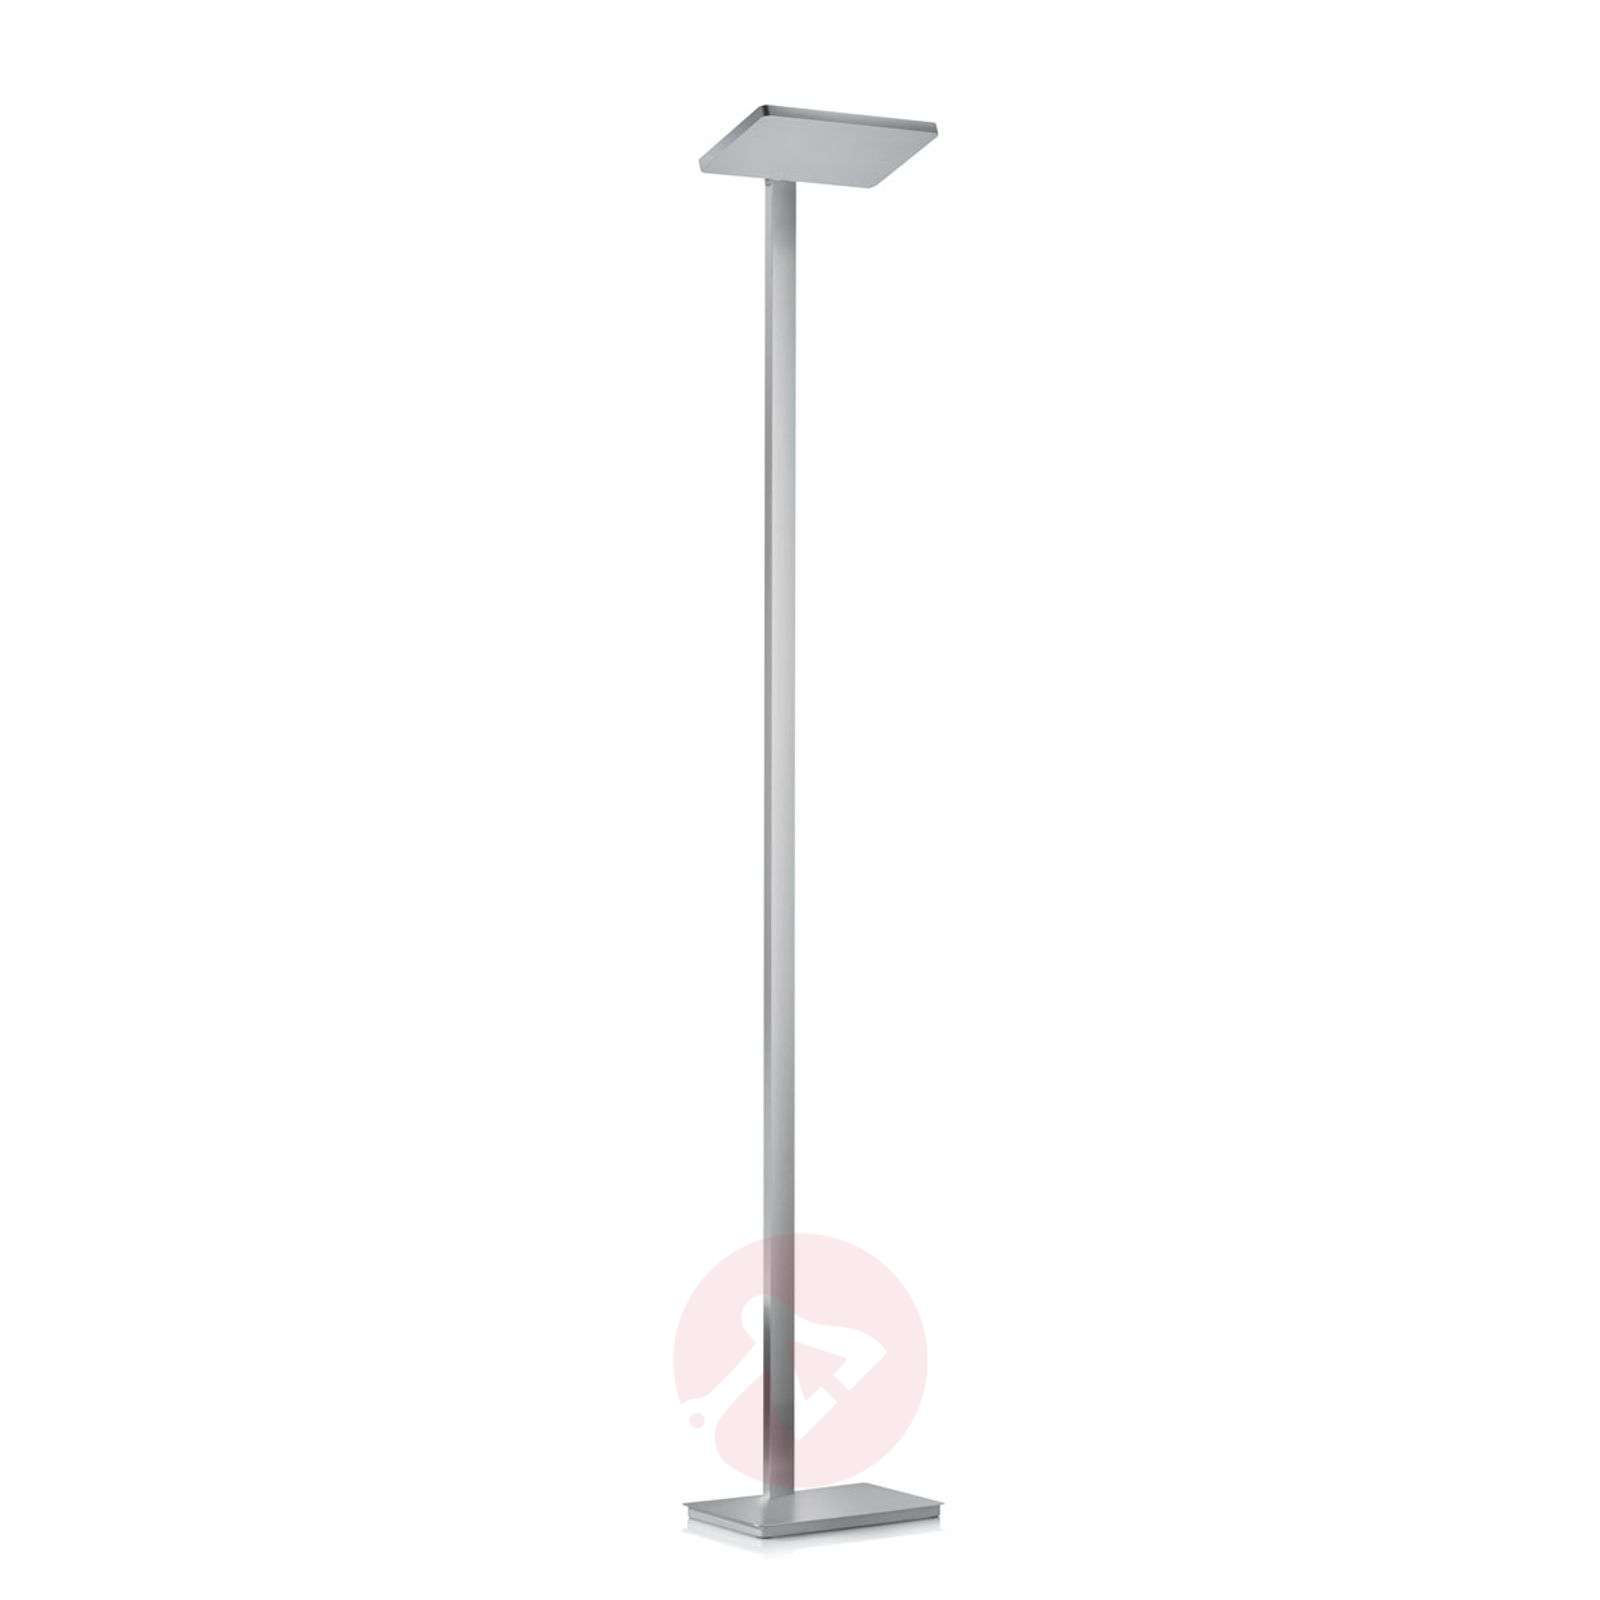 Modern led floor lamp geri in matt nickel lights modern led floor lamp geri in matt nickel 4002635 01 aloadofball Image collections